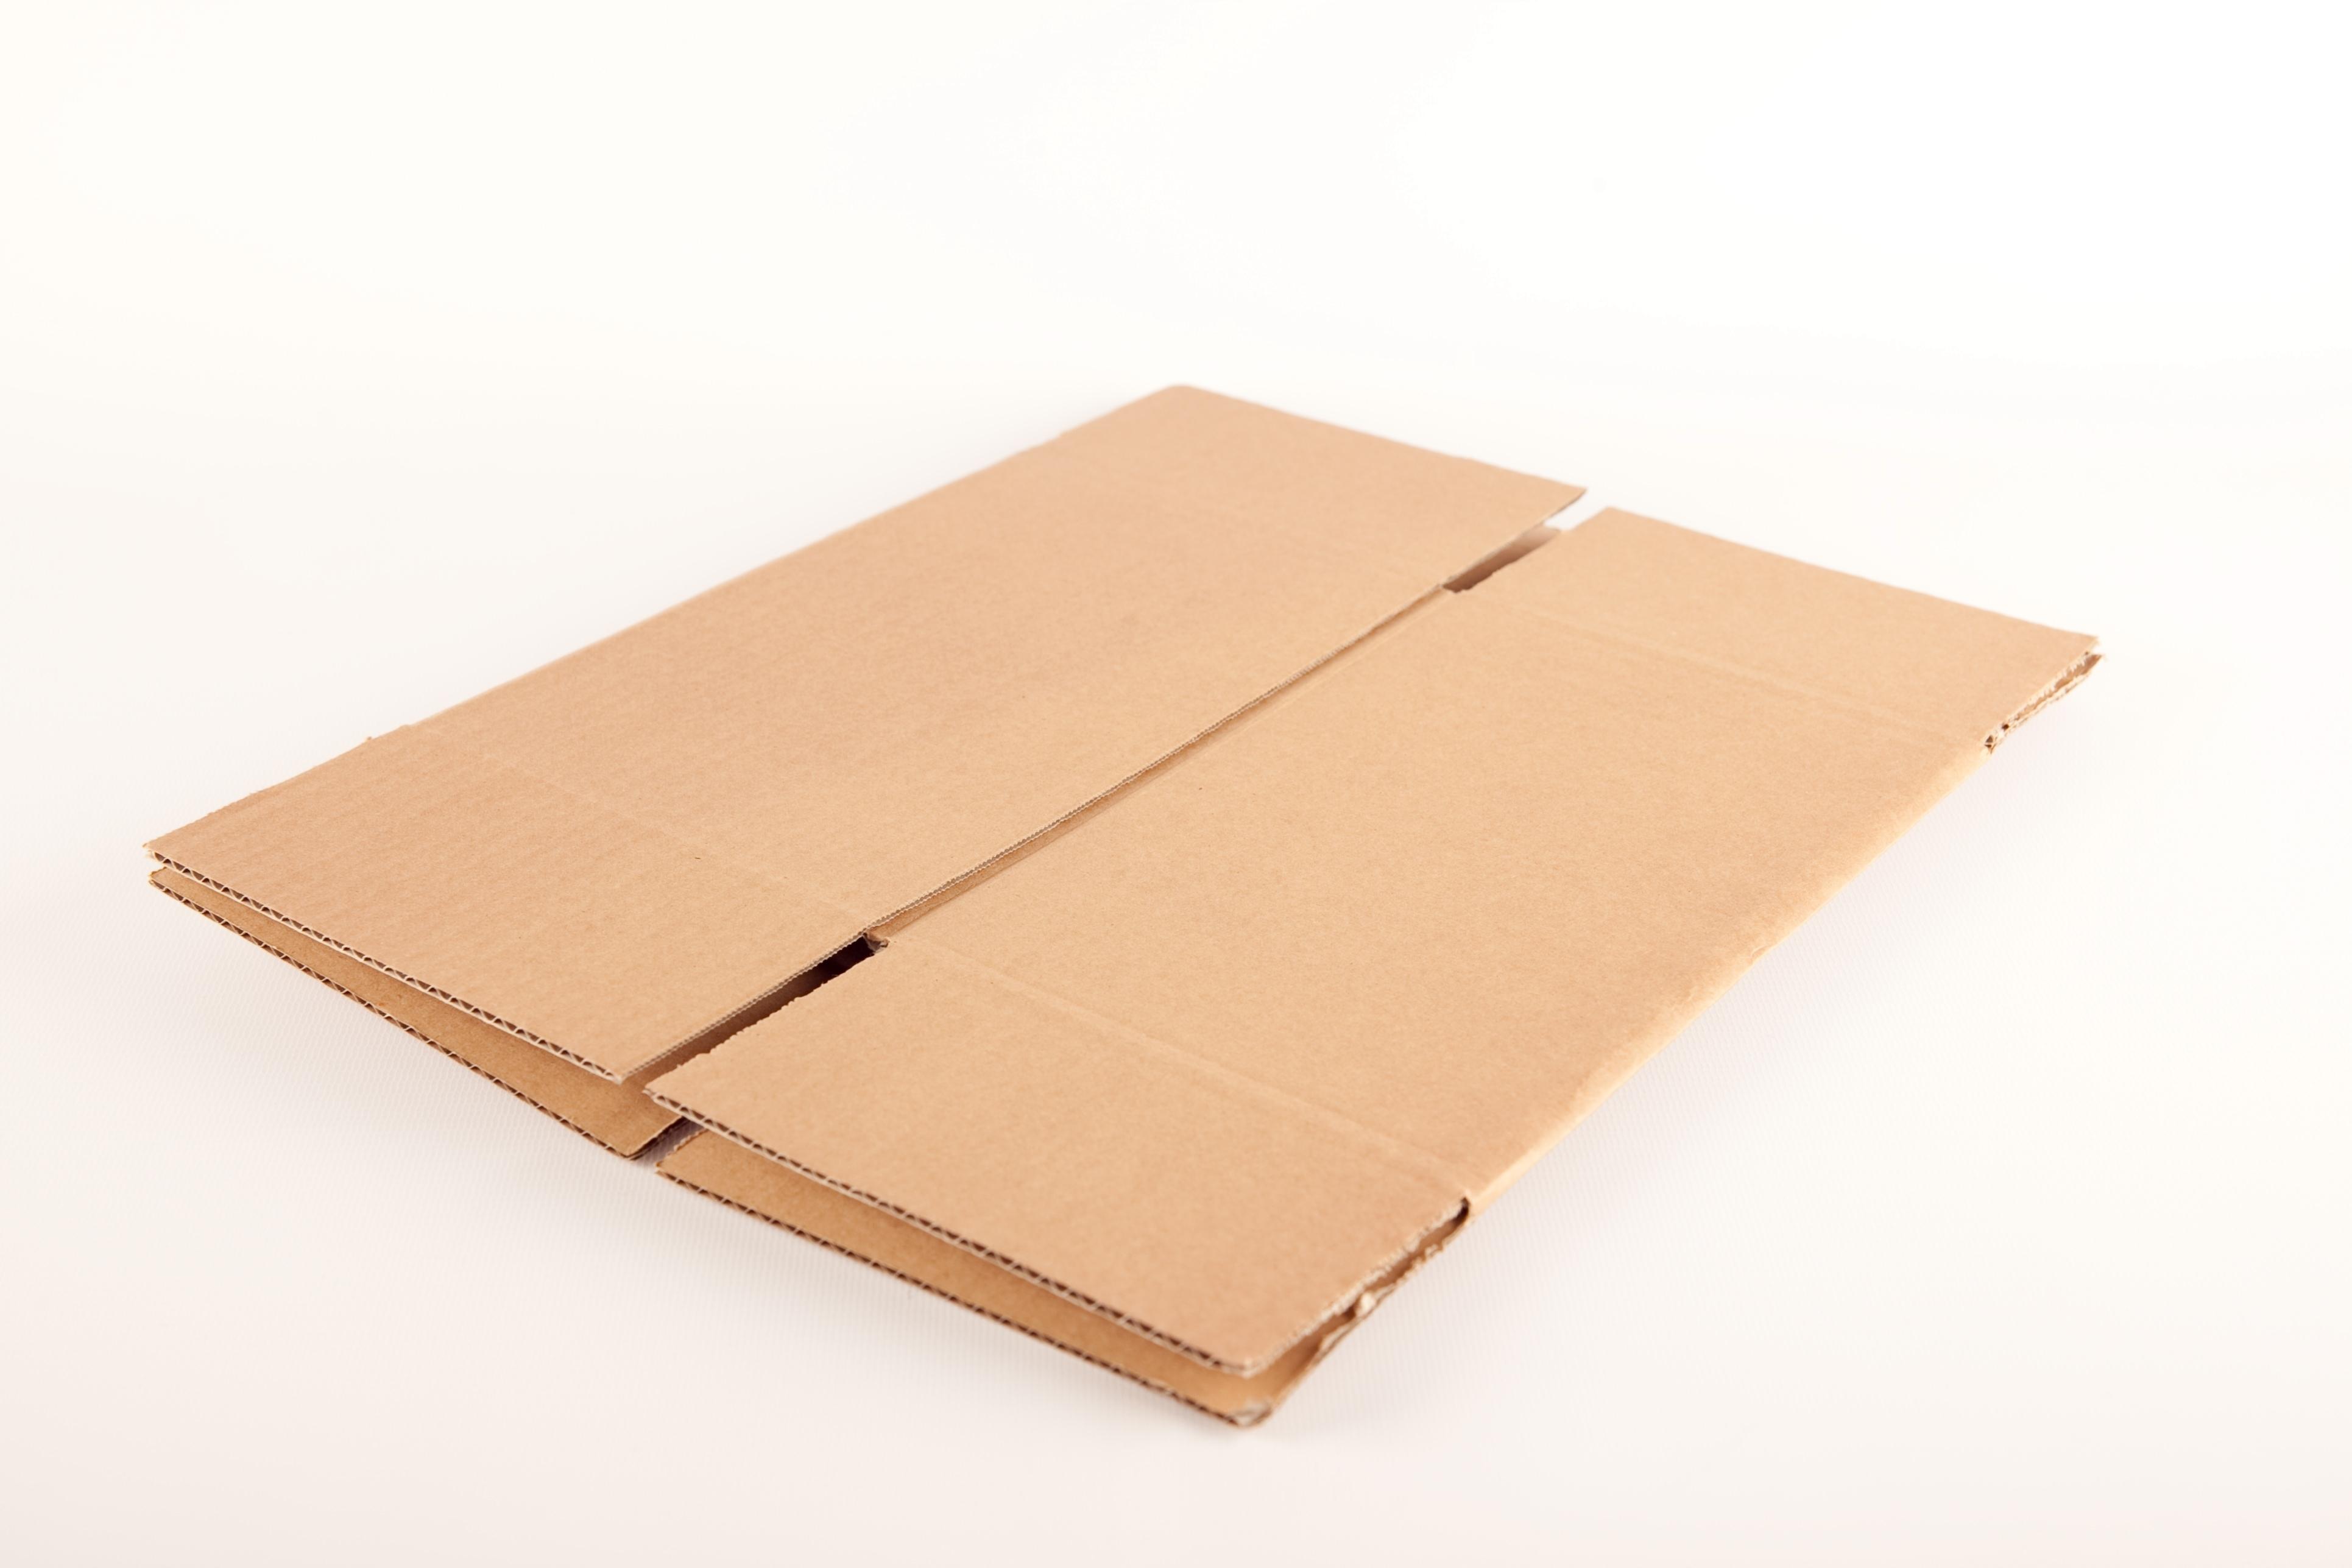 254 x 203 x 152mm Single Wall Cardboard Boxes - 3